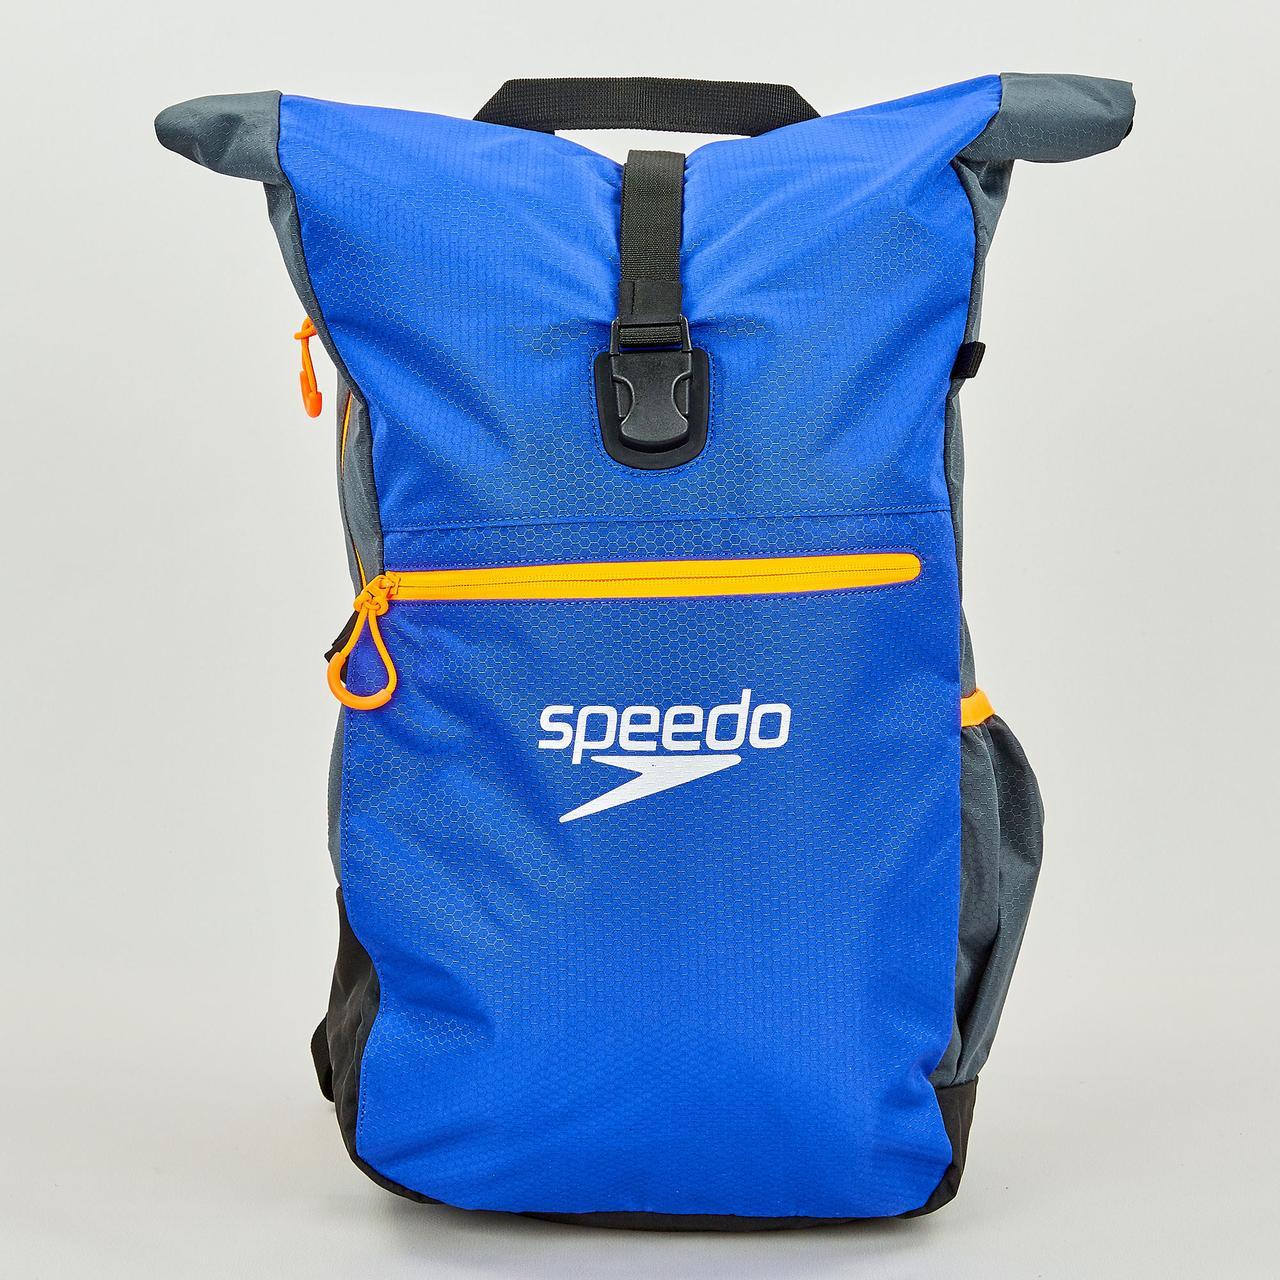 Рюкзак спортивный Speedo TEAM RUCKSACK III (полиэстер, 50х17х34см, синий-серый) PZ-807688C299